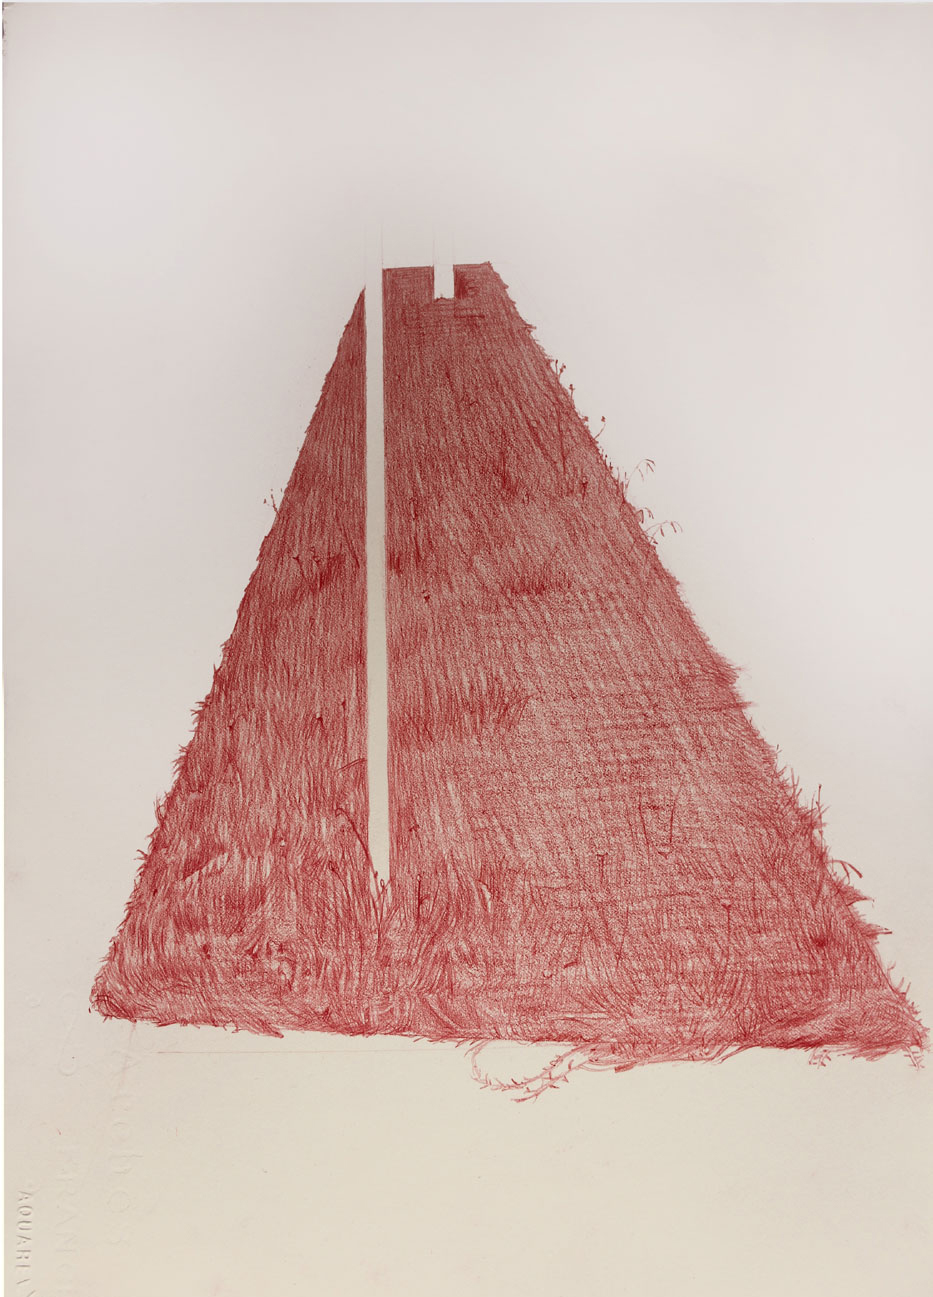 Vin Ryan,  Strip, Sunshine , 2012, pencil on paper, 38 x 28cm